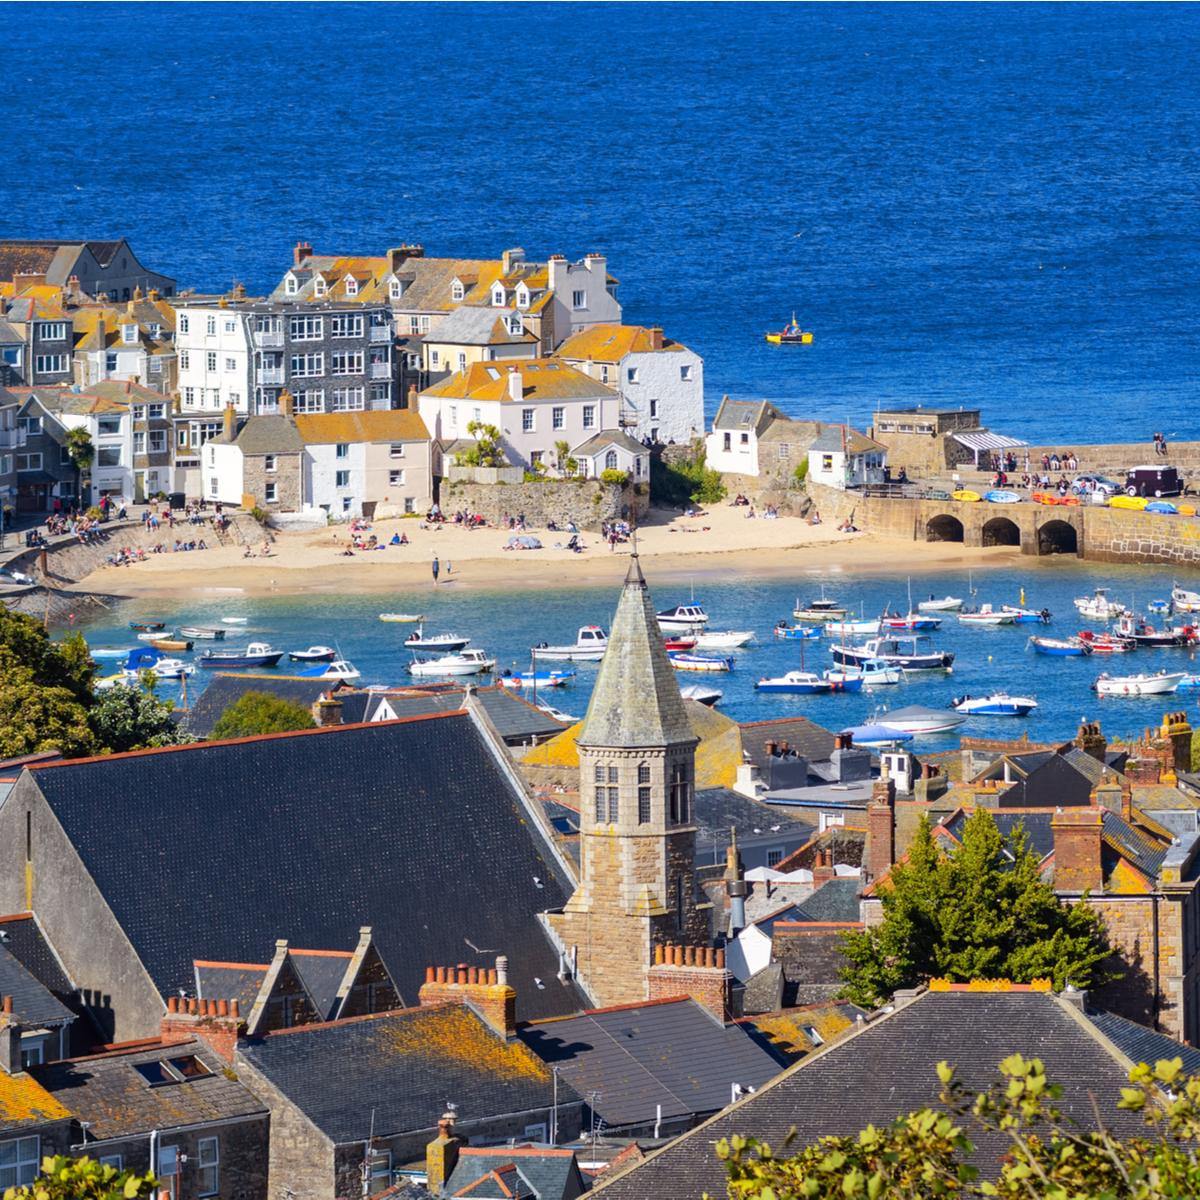 St Ives Old town, a popular seaside resort on atlantic coast, Cornwall, United Kingdom.